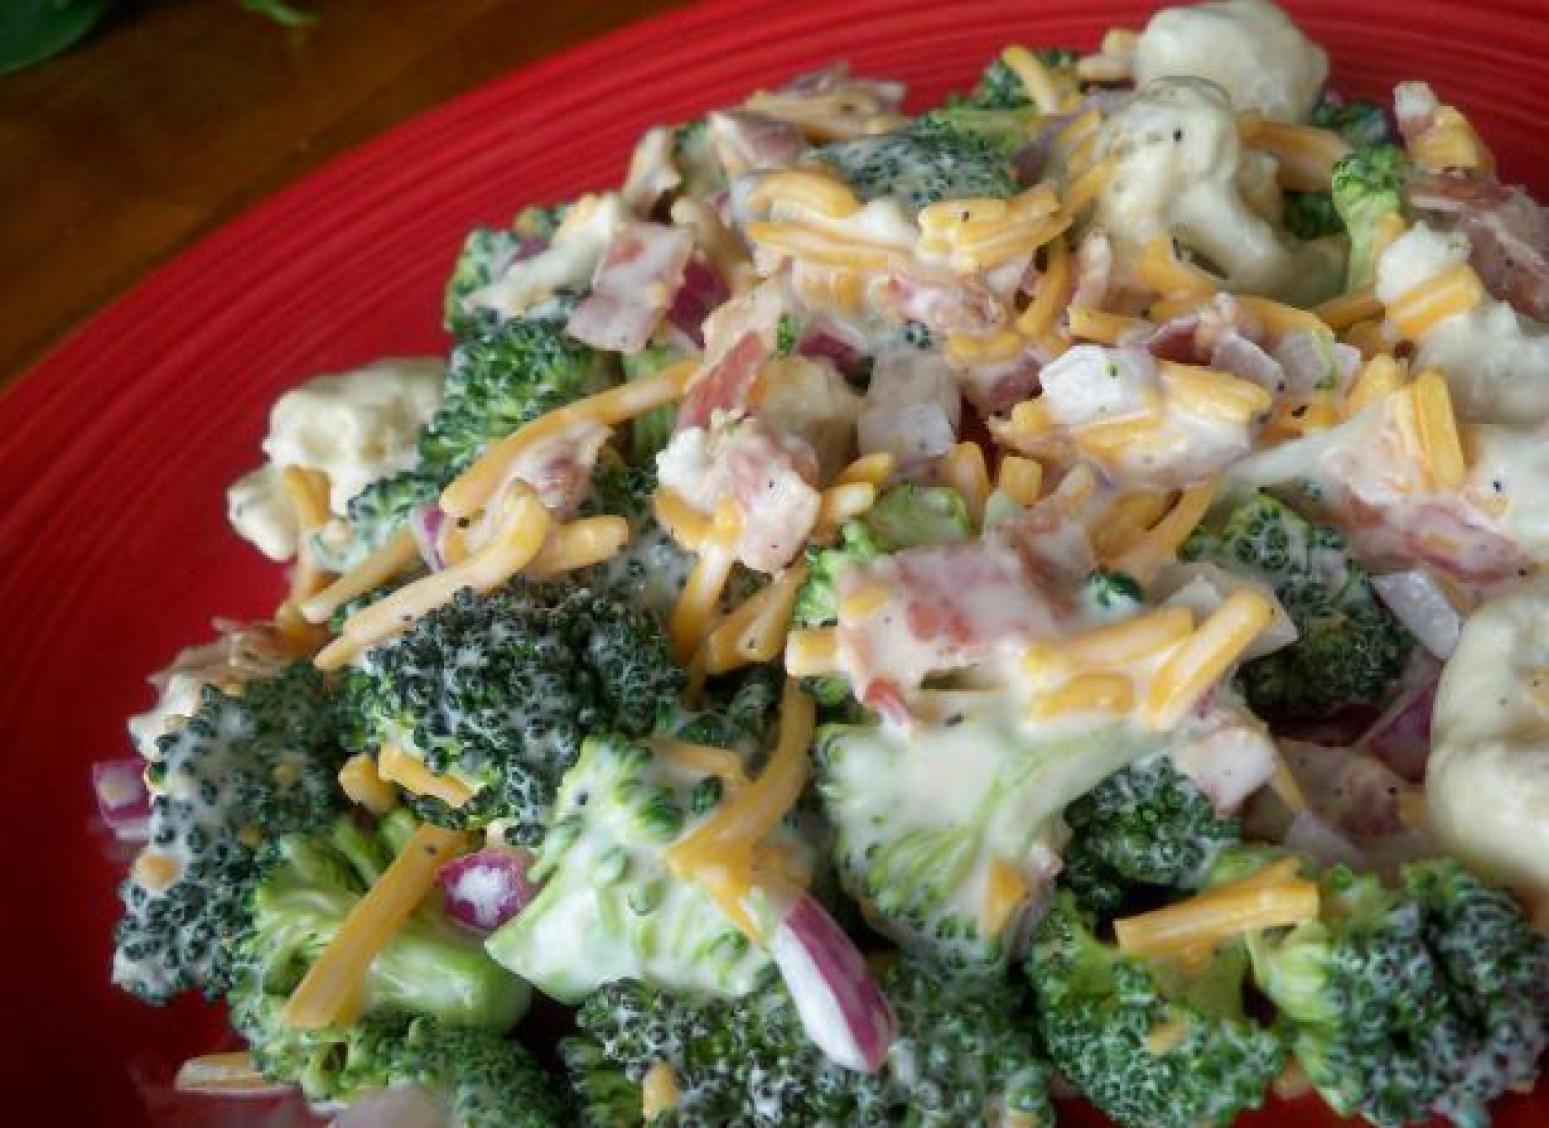 Cauliflower Salad Recipes  Broccoli and Cauliflower Salad Recipe 2